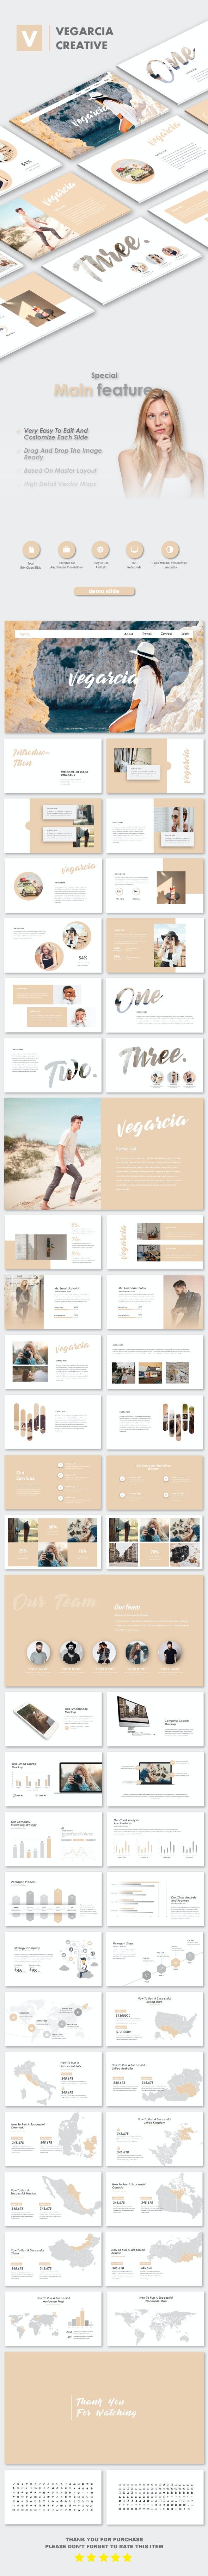 Vegarcia Creative PowerPoint Templates - Creative PowerPoint Templates